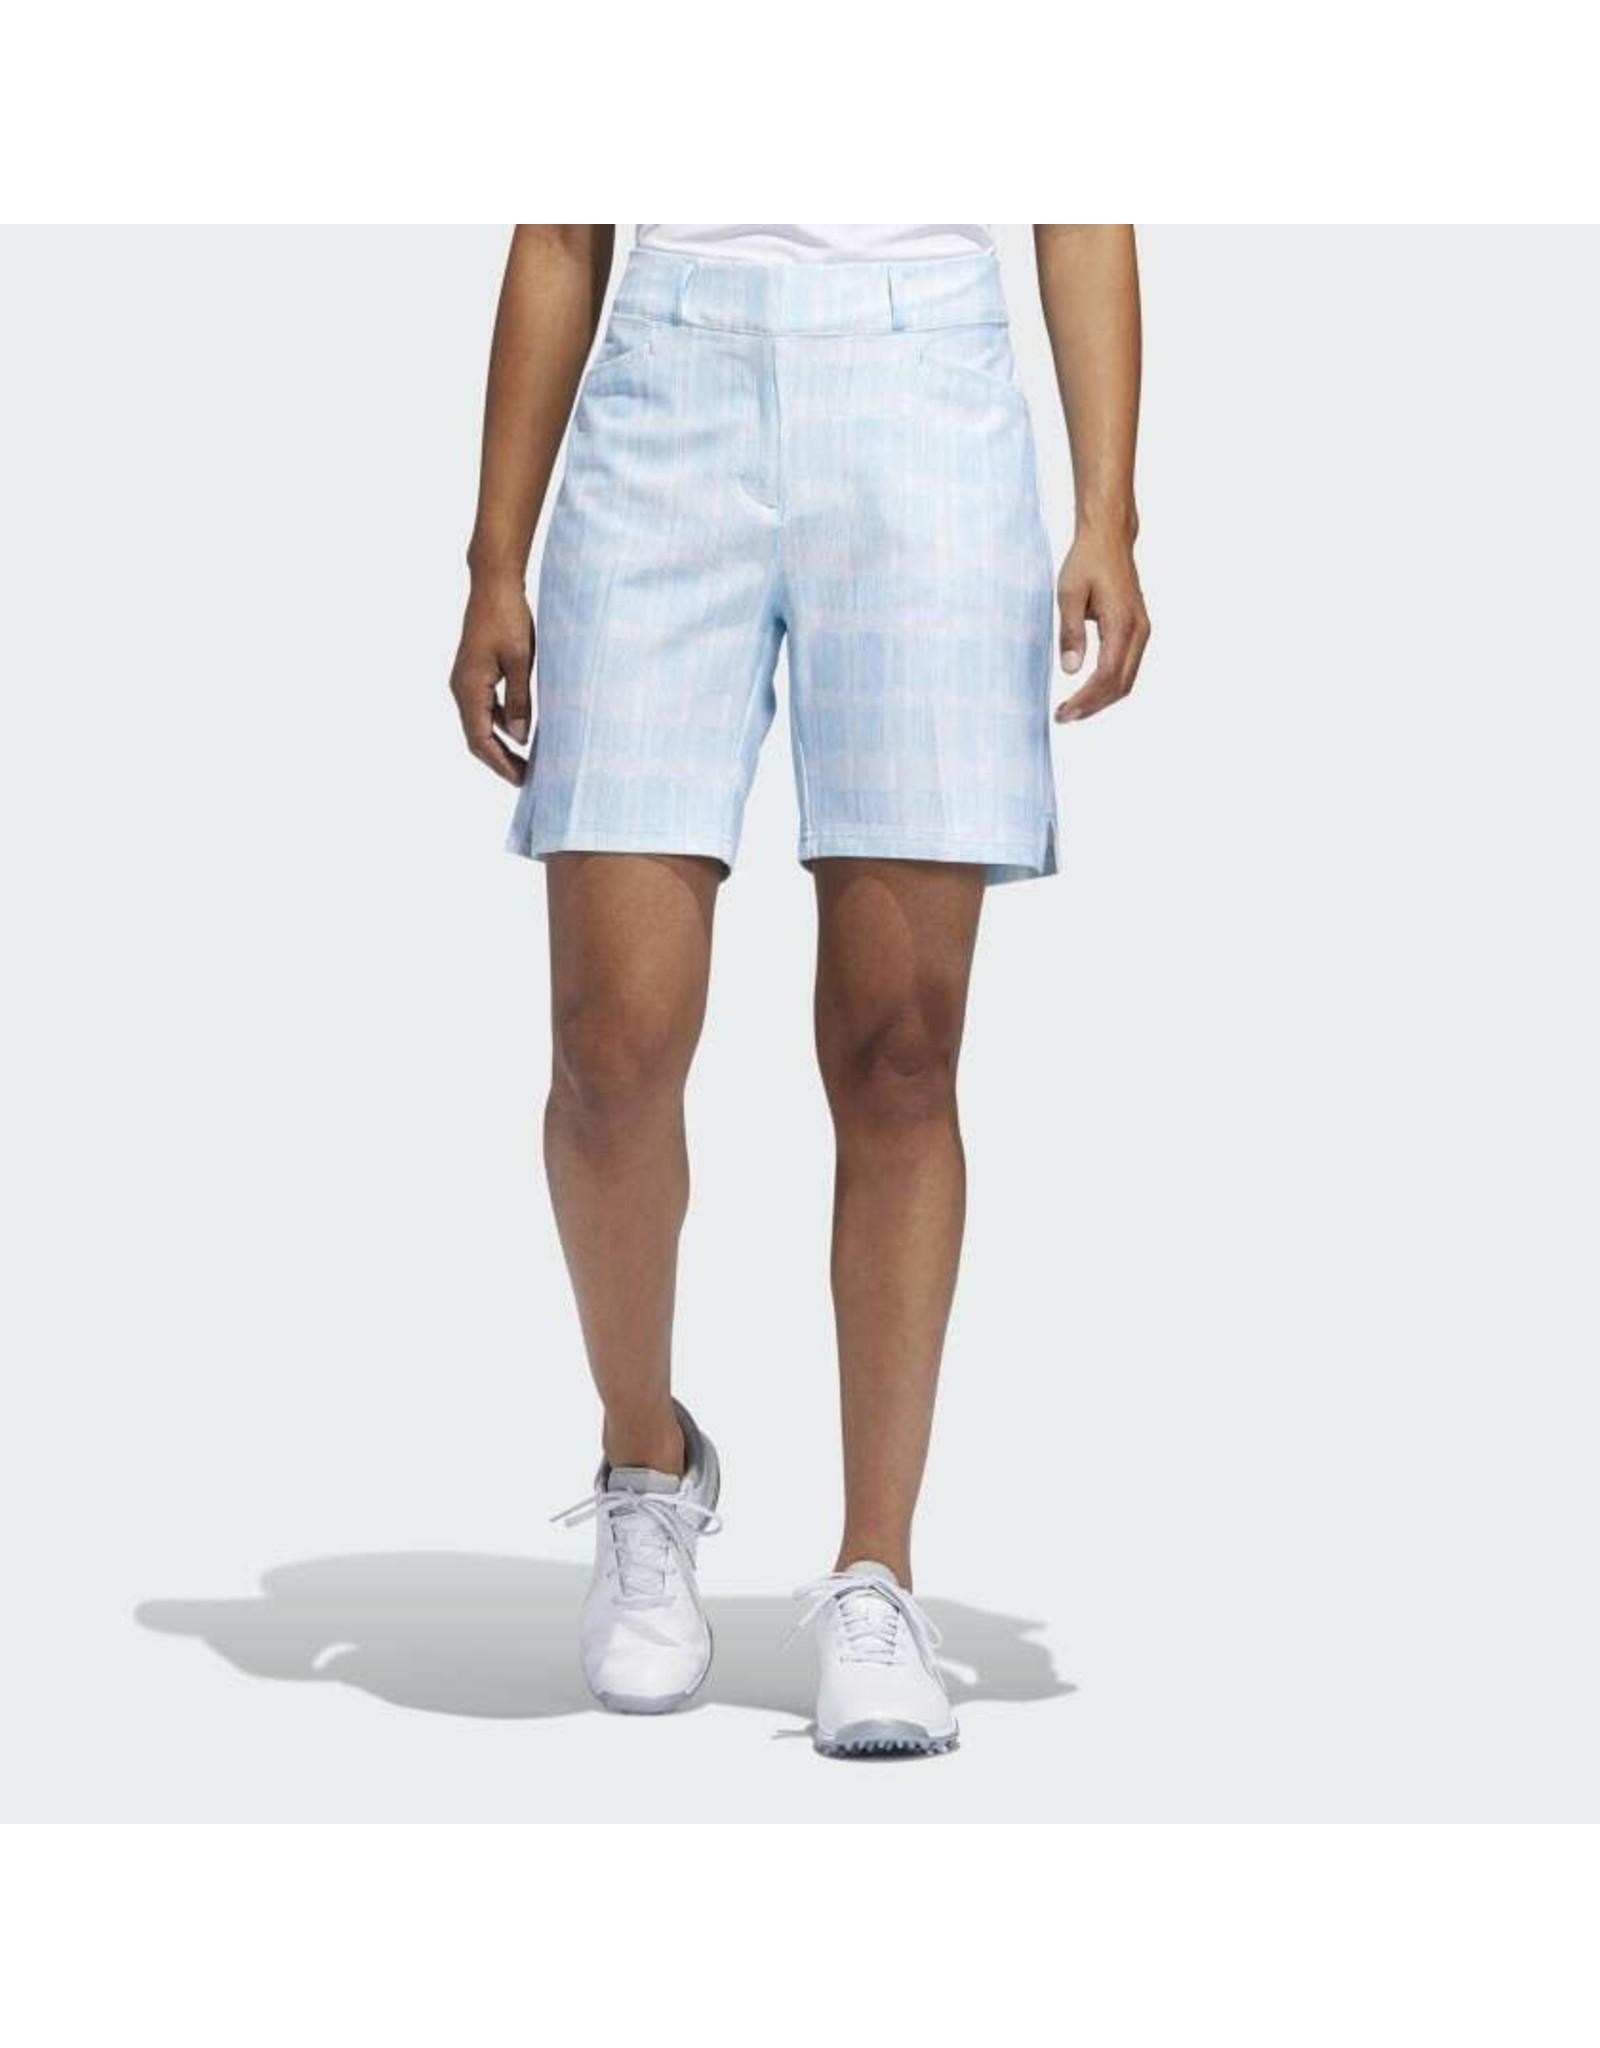 Adidas Adidas Women's Shorts (DT6045)